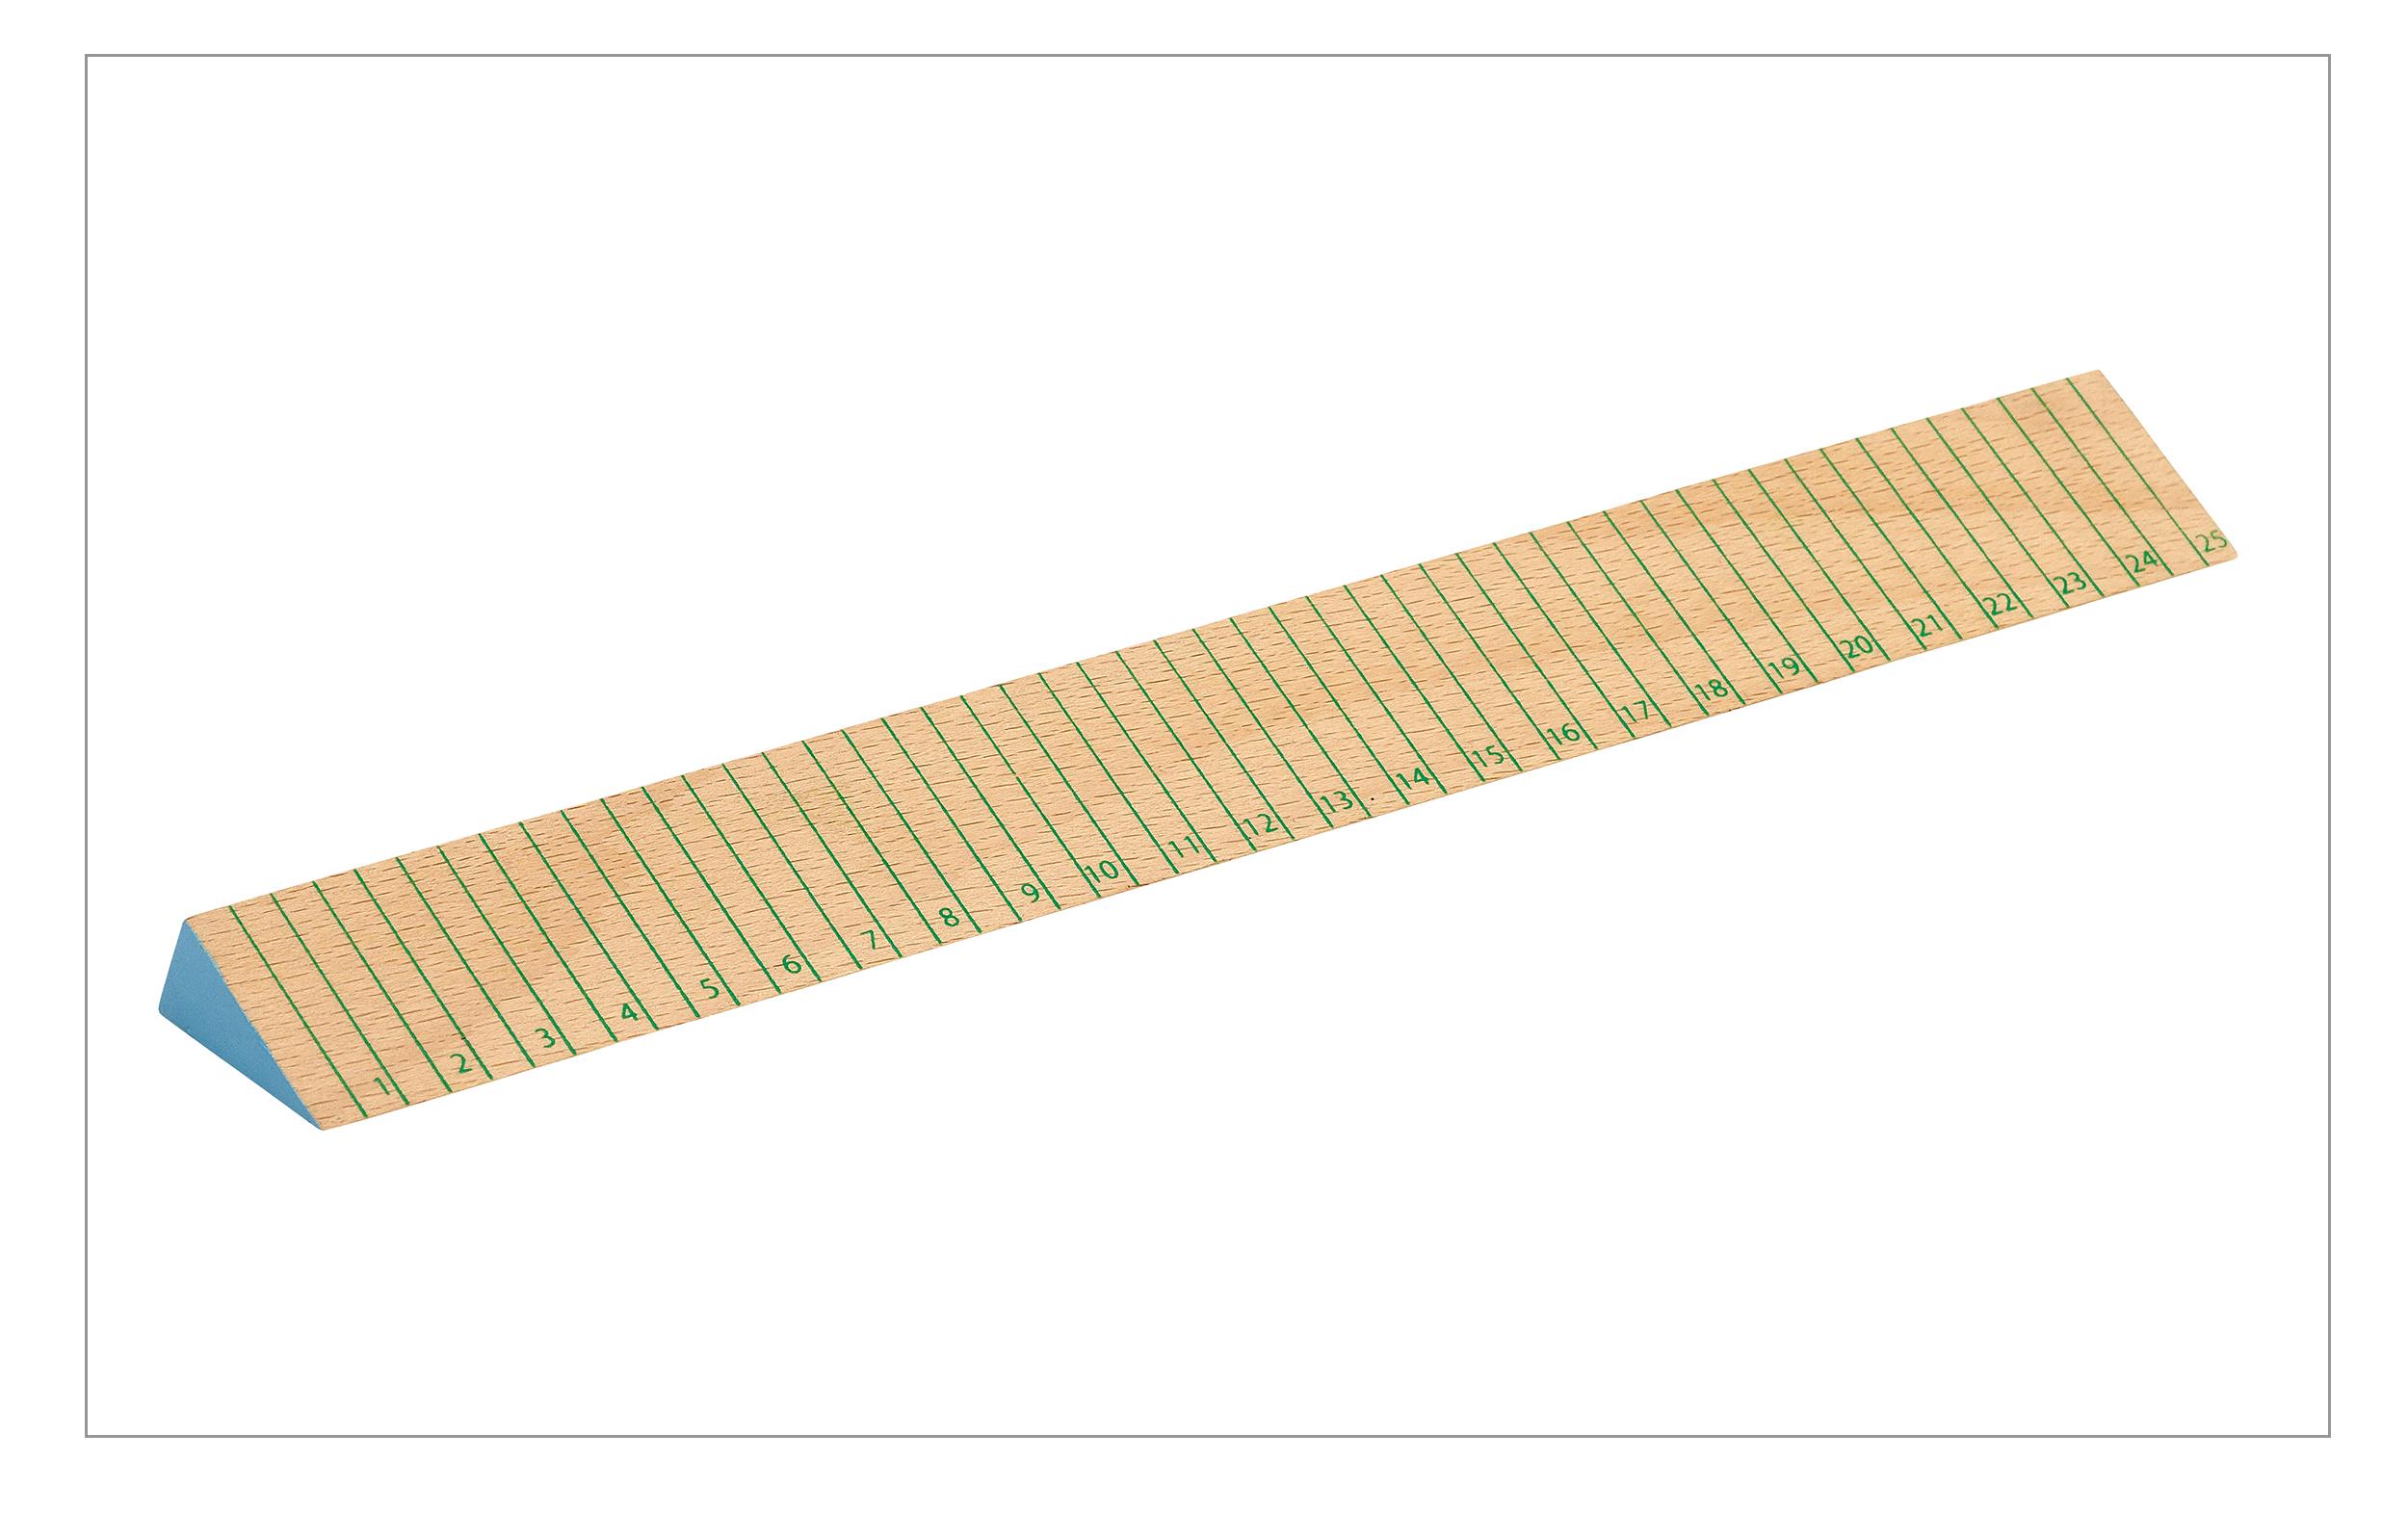 Wooden Ruler 05